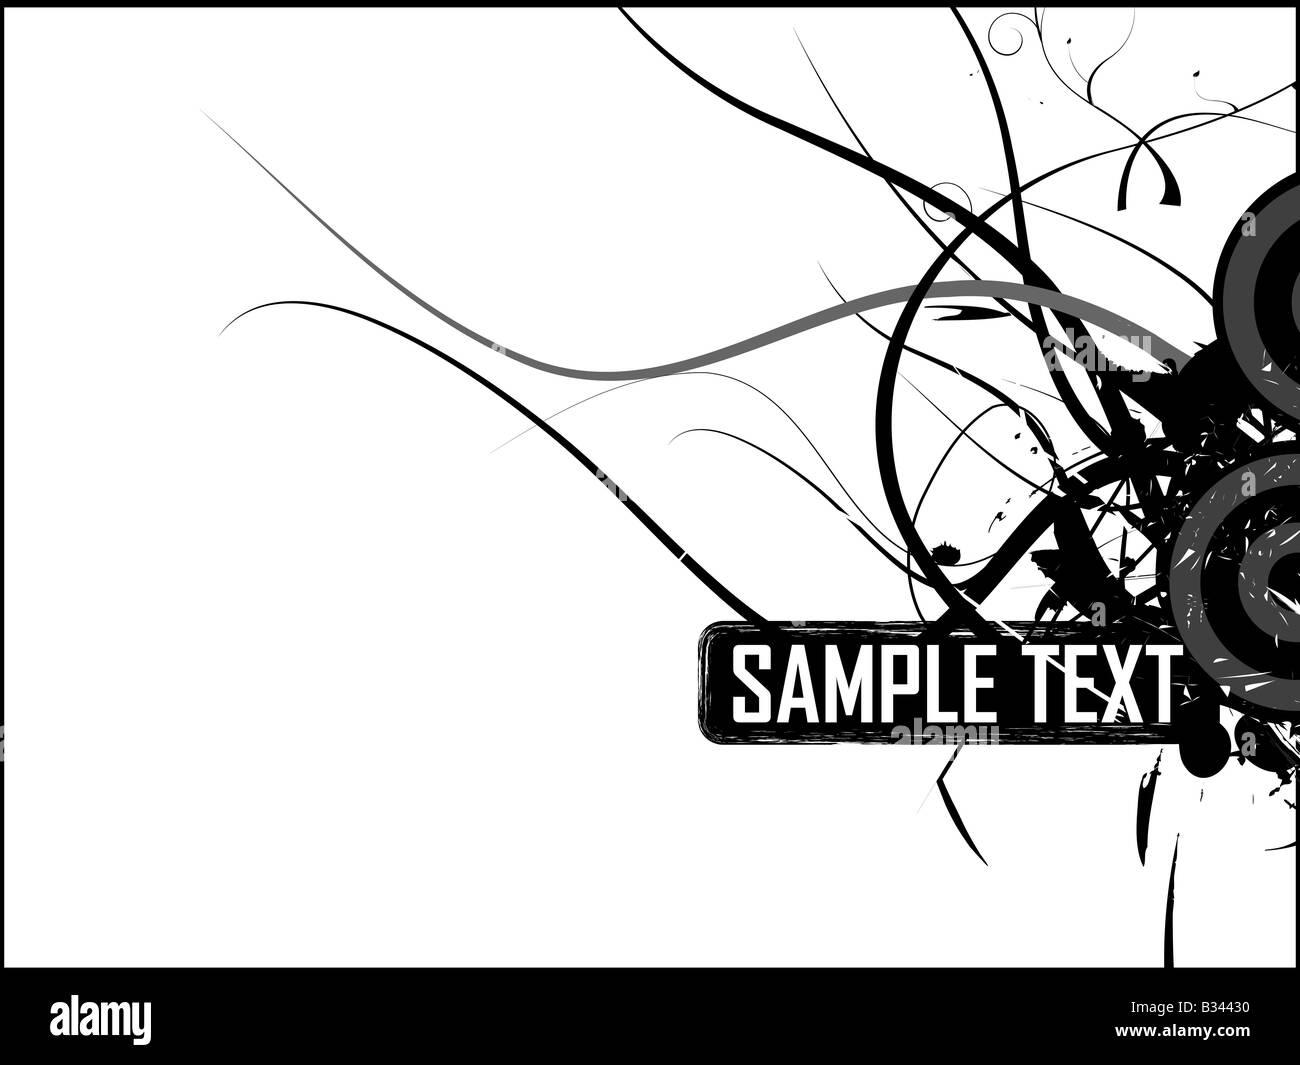 text template swirls on grungy stock photos text template swirls